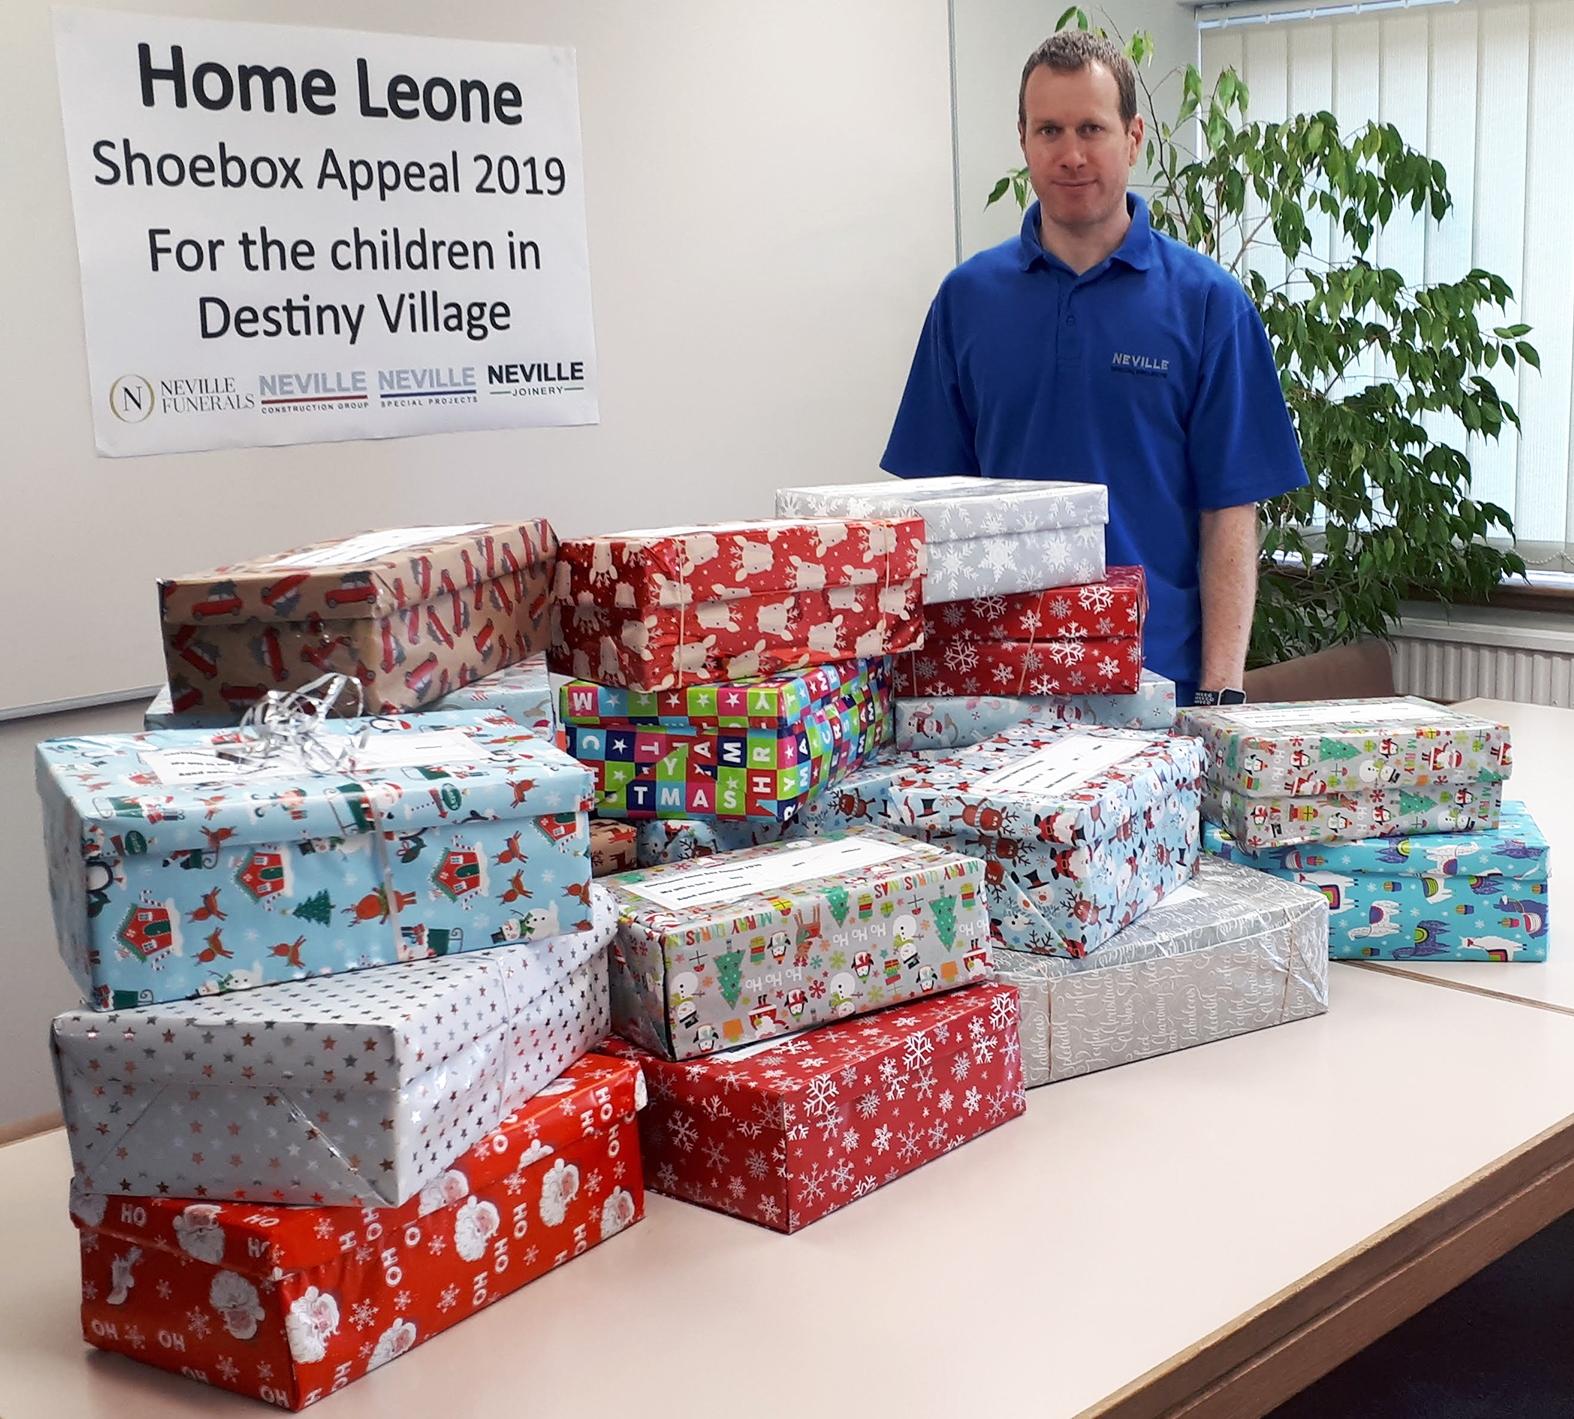 Home Leone Shoebox Appeal – Update